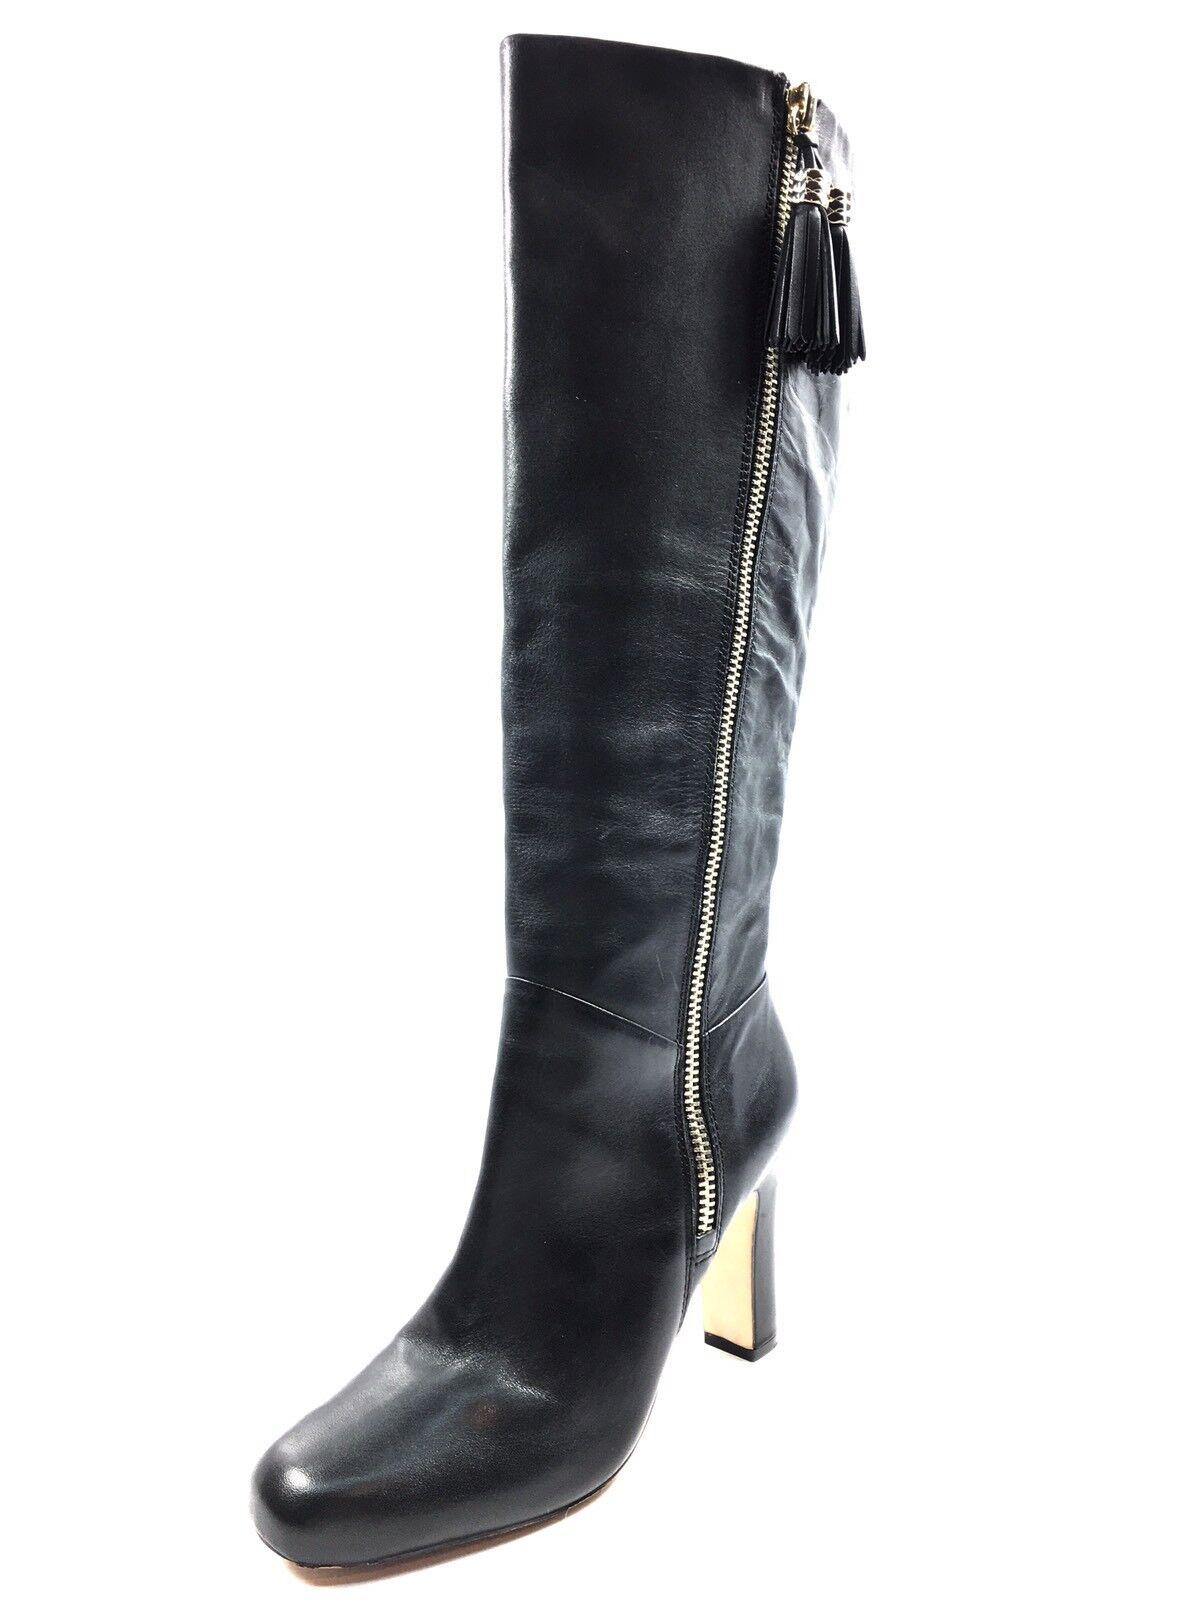 280 Louise et Cie Zavia Black Leather Knee High Boots Women's Size 8 M